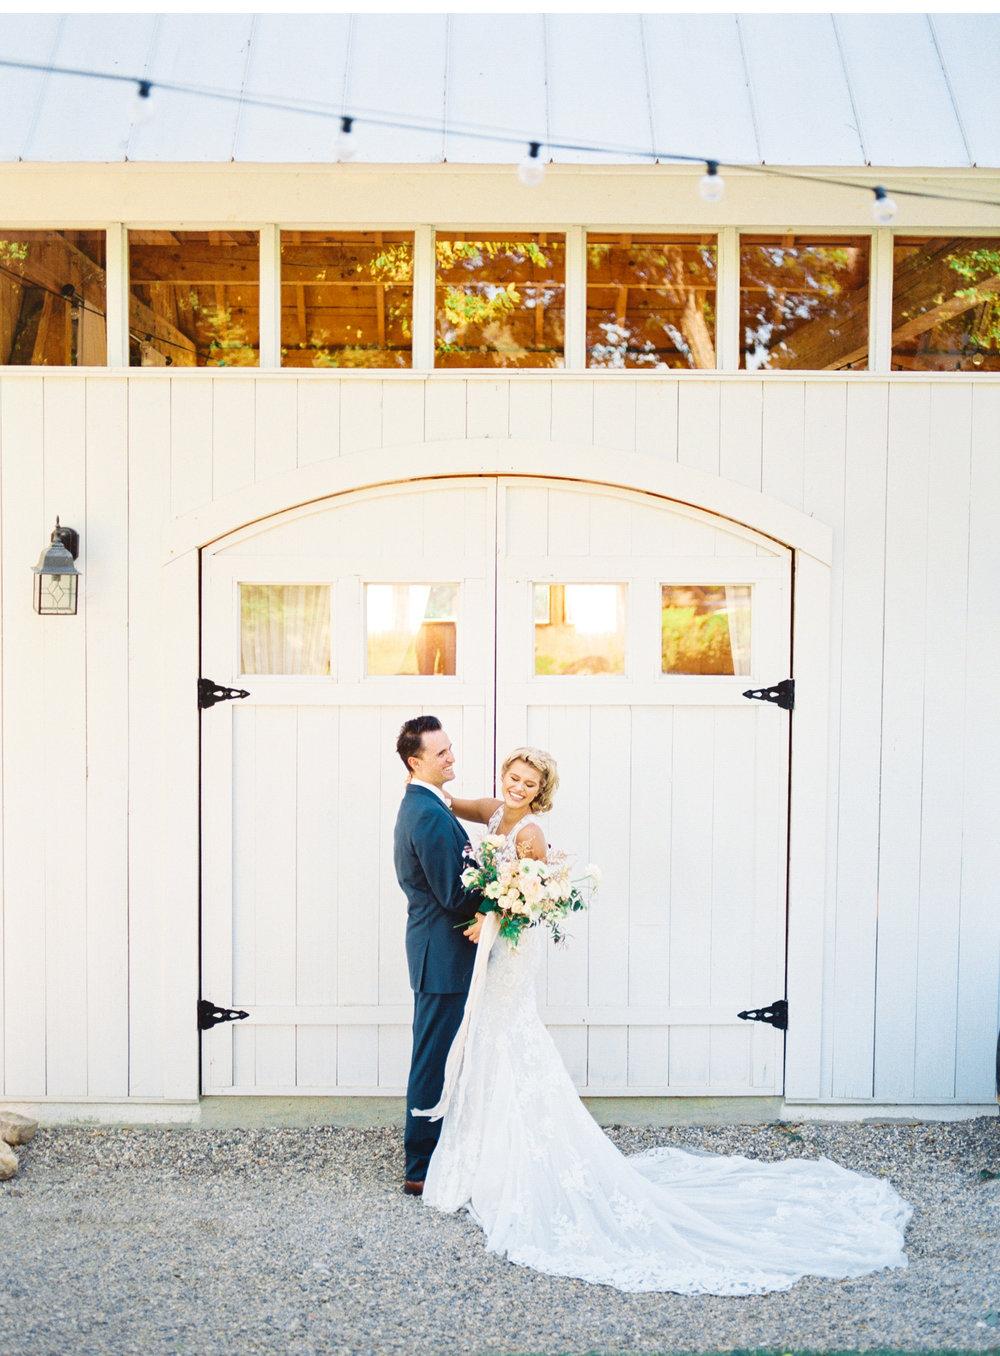 Southern-California-Wedding-Natalie-Schutt-Photography_12.jpg